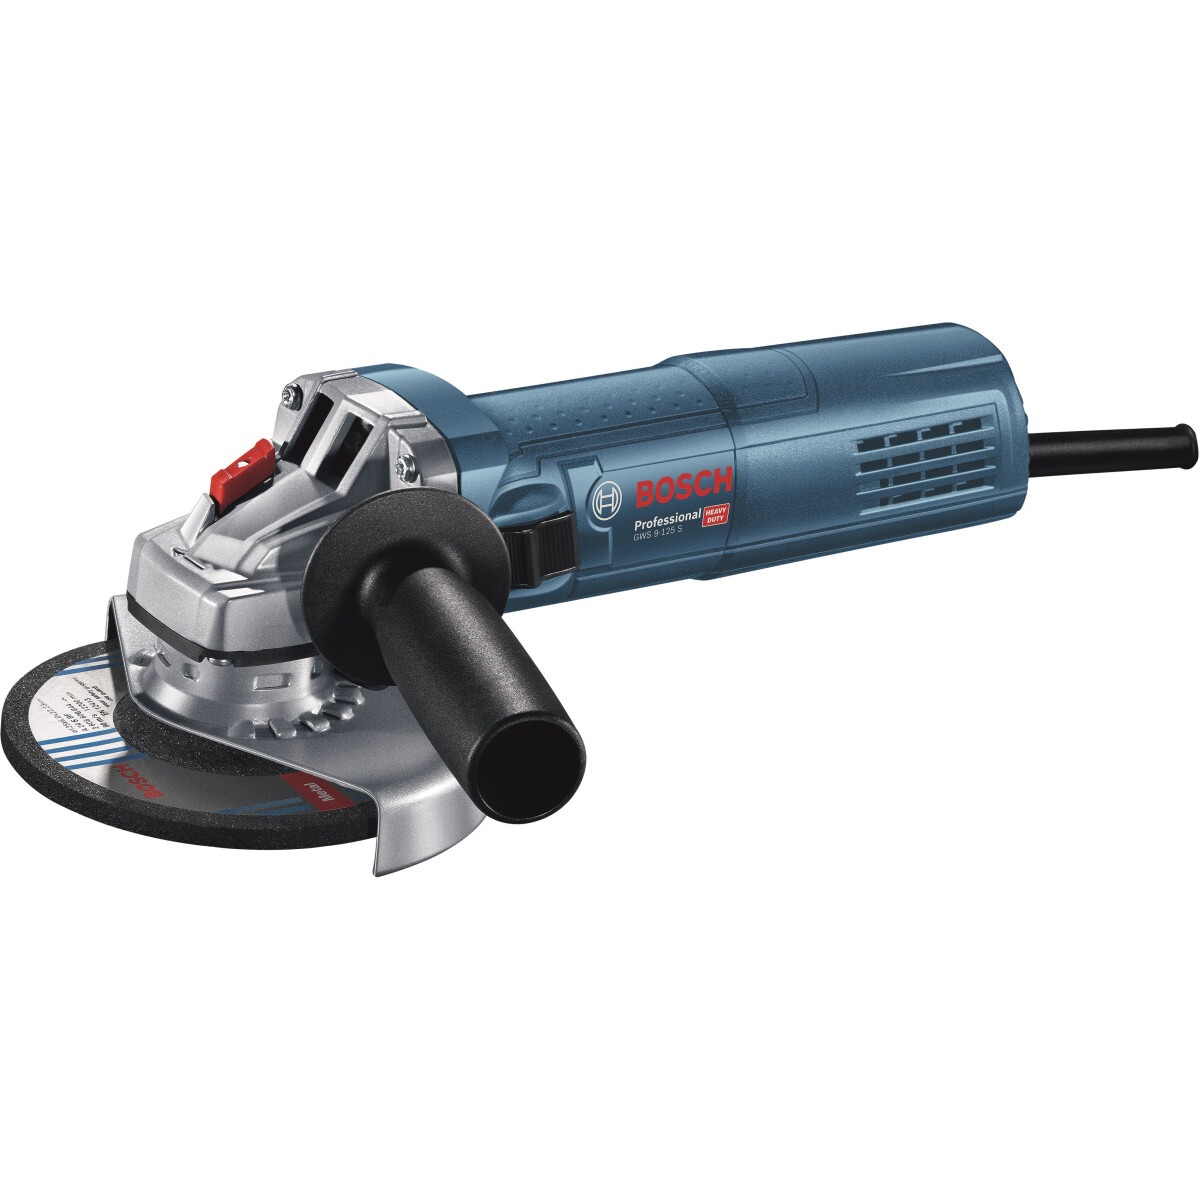 "Bosch GWS 9-115 S 4 1/2"" (115mm) 900 W Slim Grip Grinder with Speed Selection"